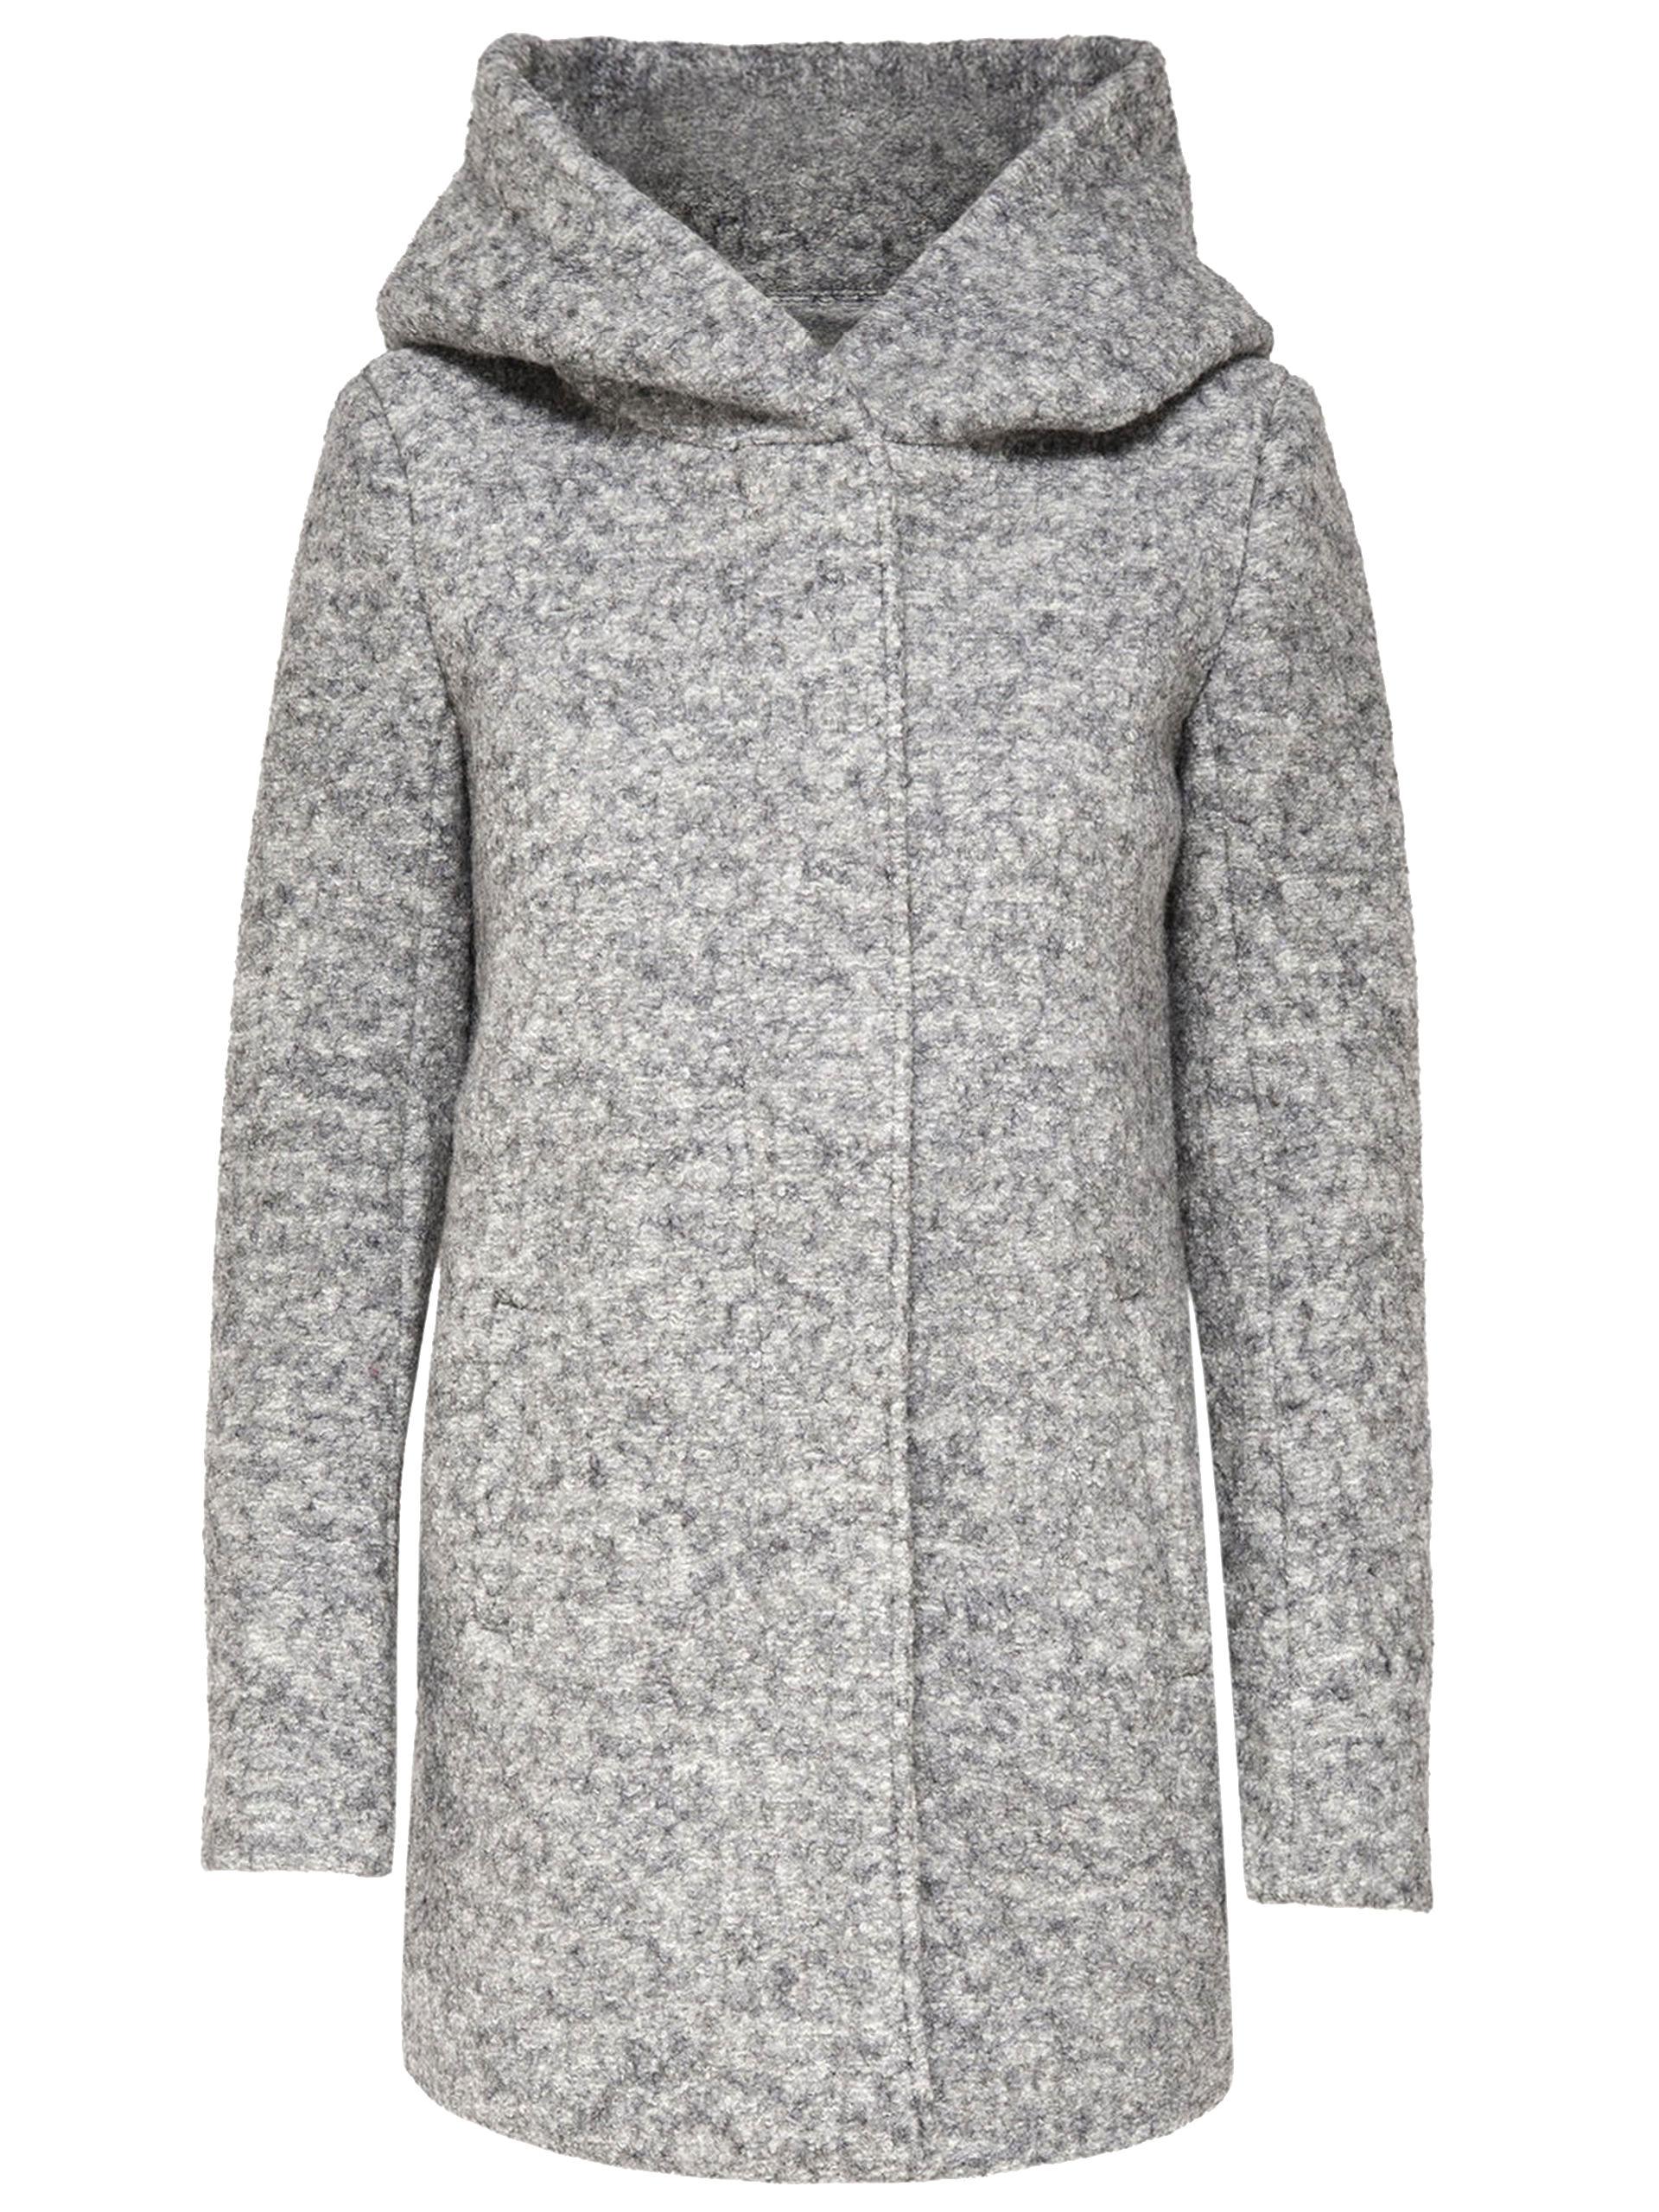 Only Damen Wollmantel Mantel Jacke Onlindie Noma Wool Coat Parka